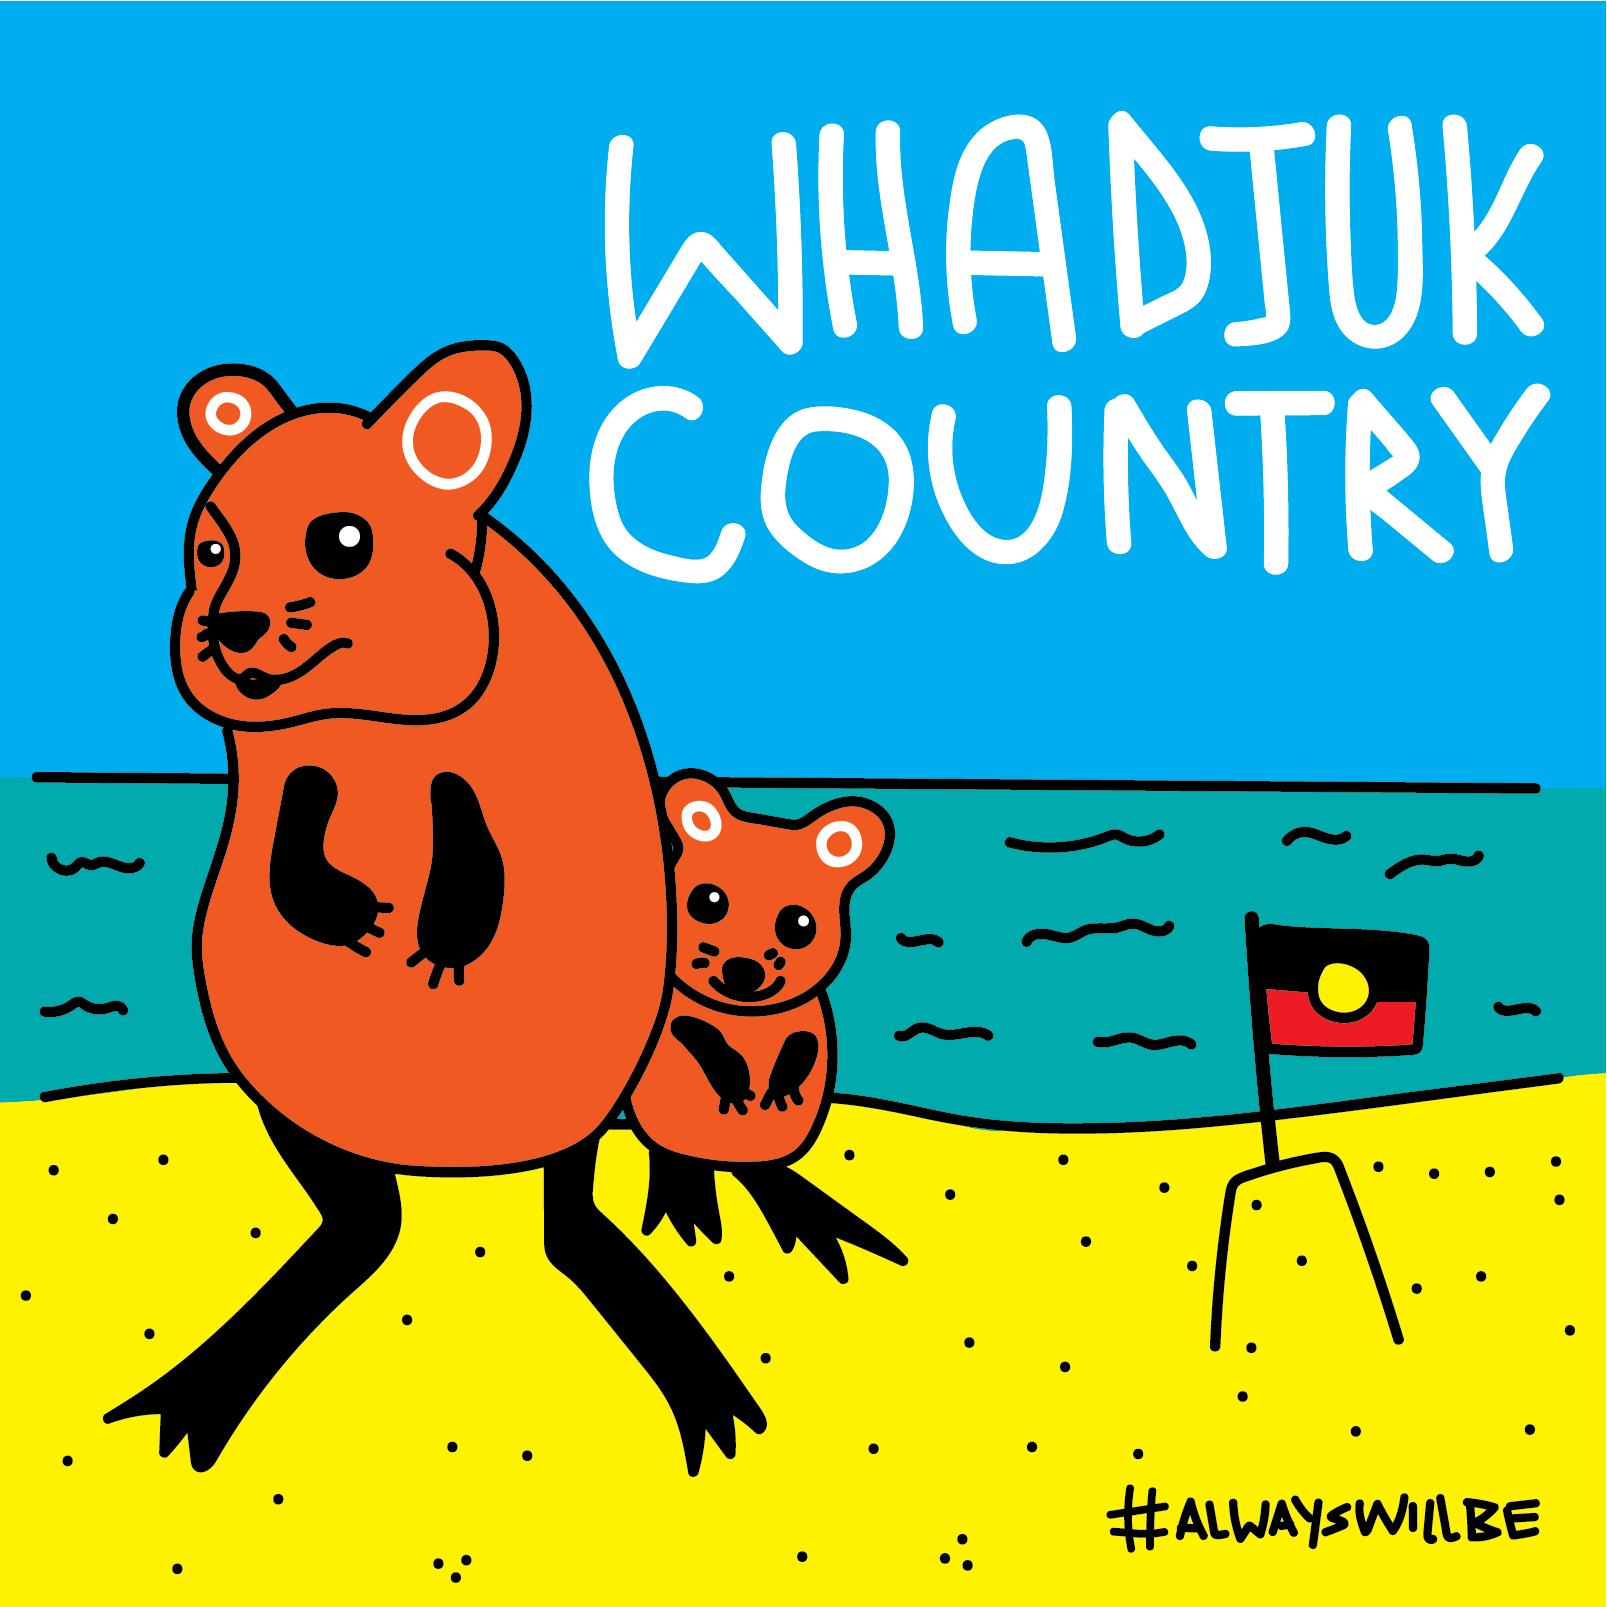 Whadjuk Country (Perth)